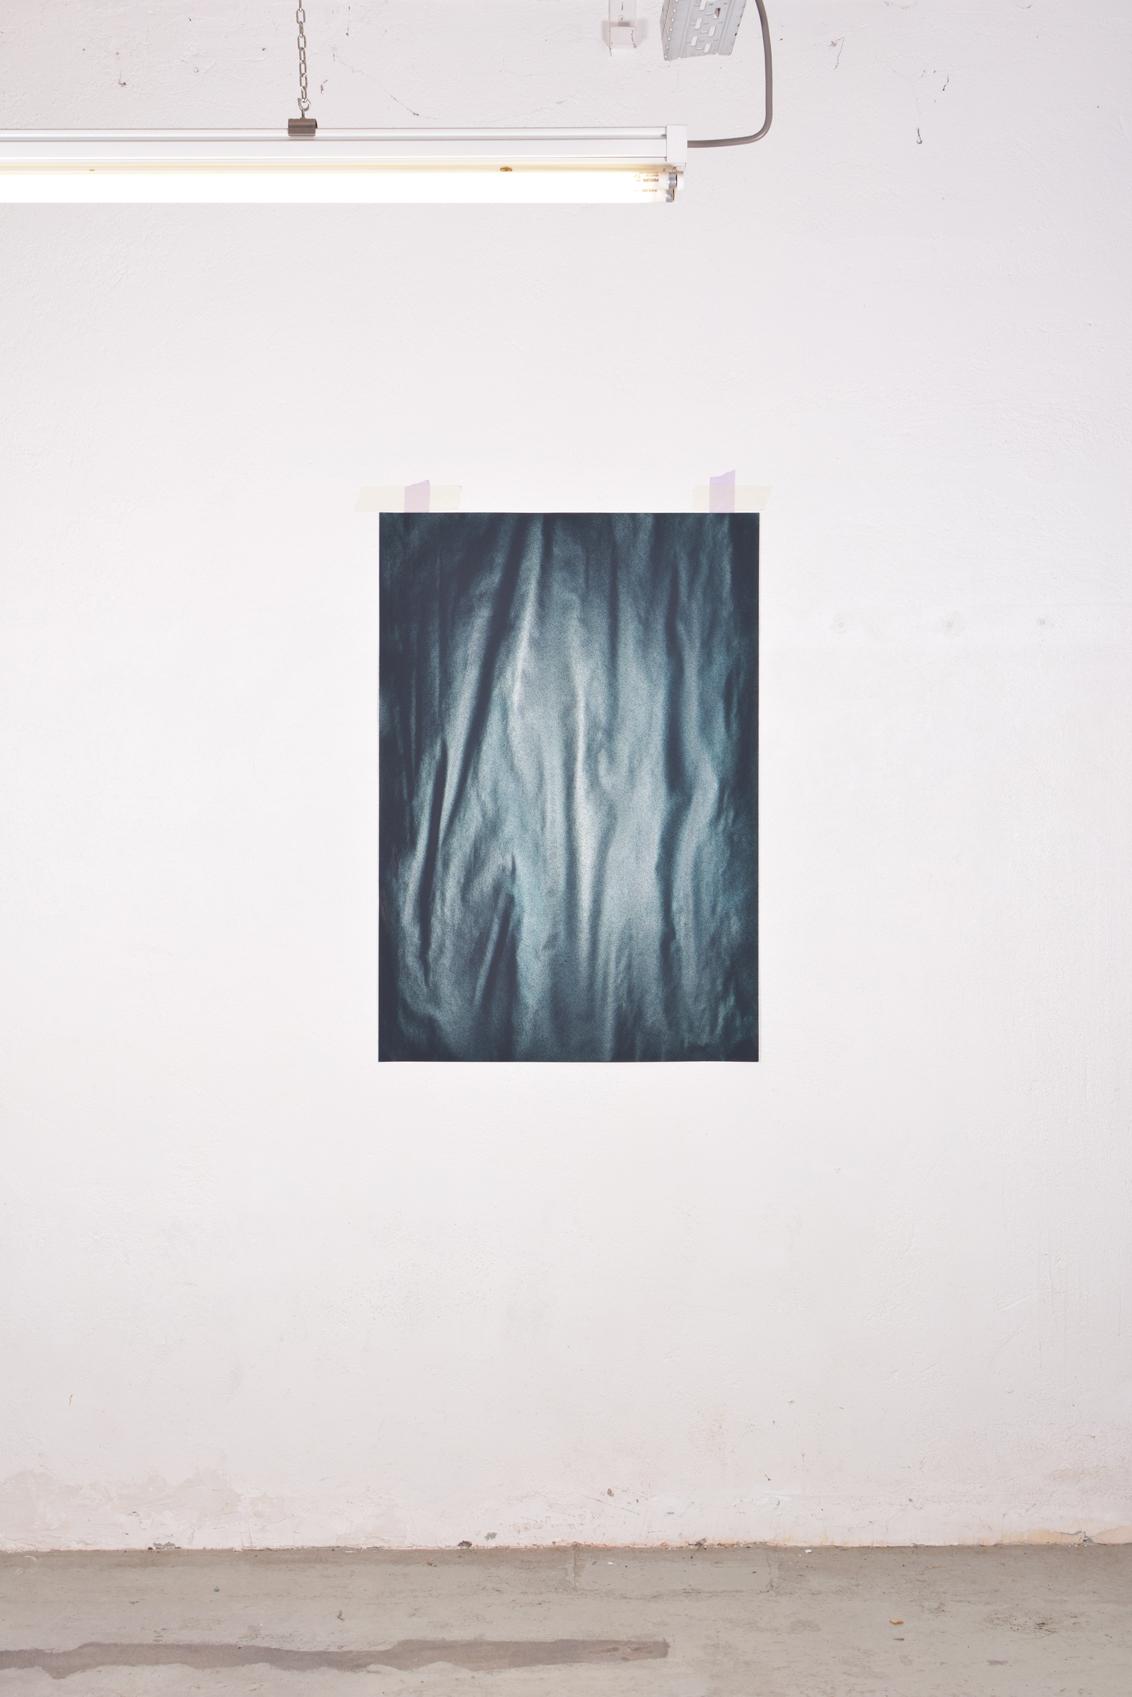 Ninfa Fluida_Double V Gallery_Marseille_19PG BV 2 70x100cm (3).jpg